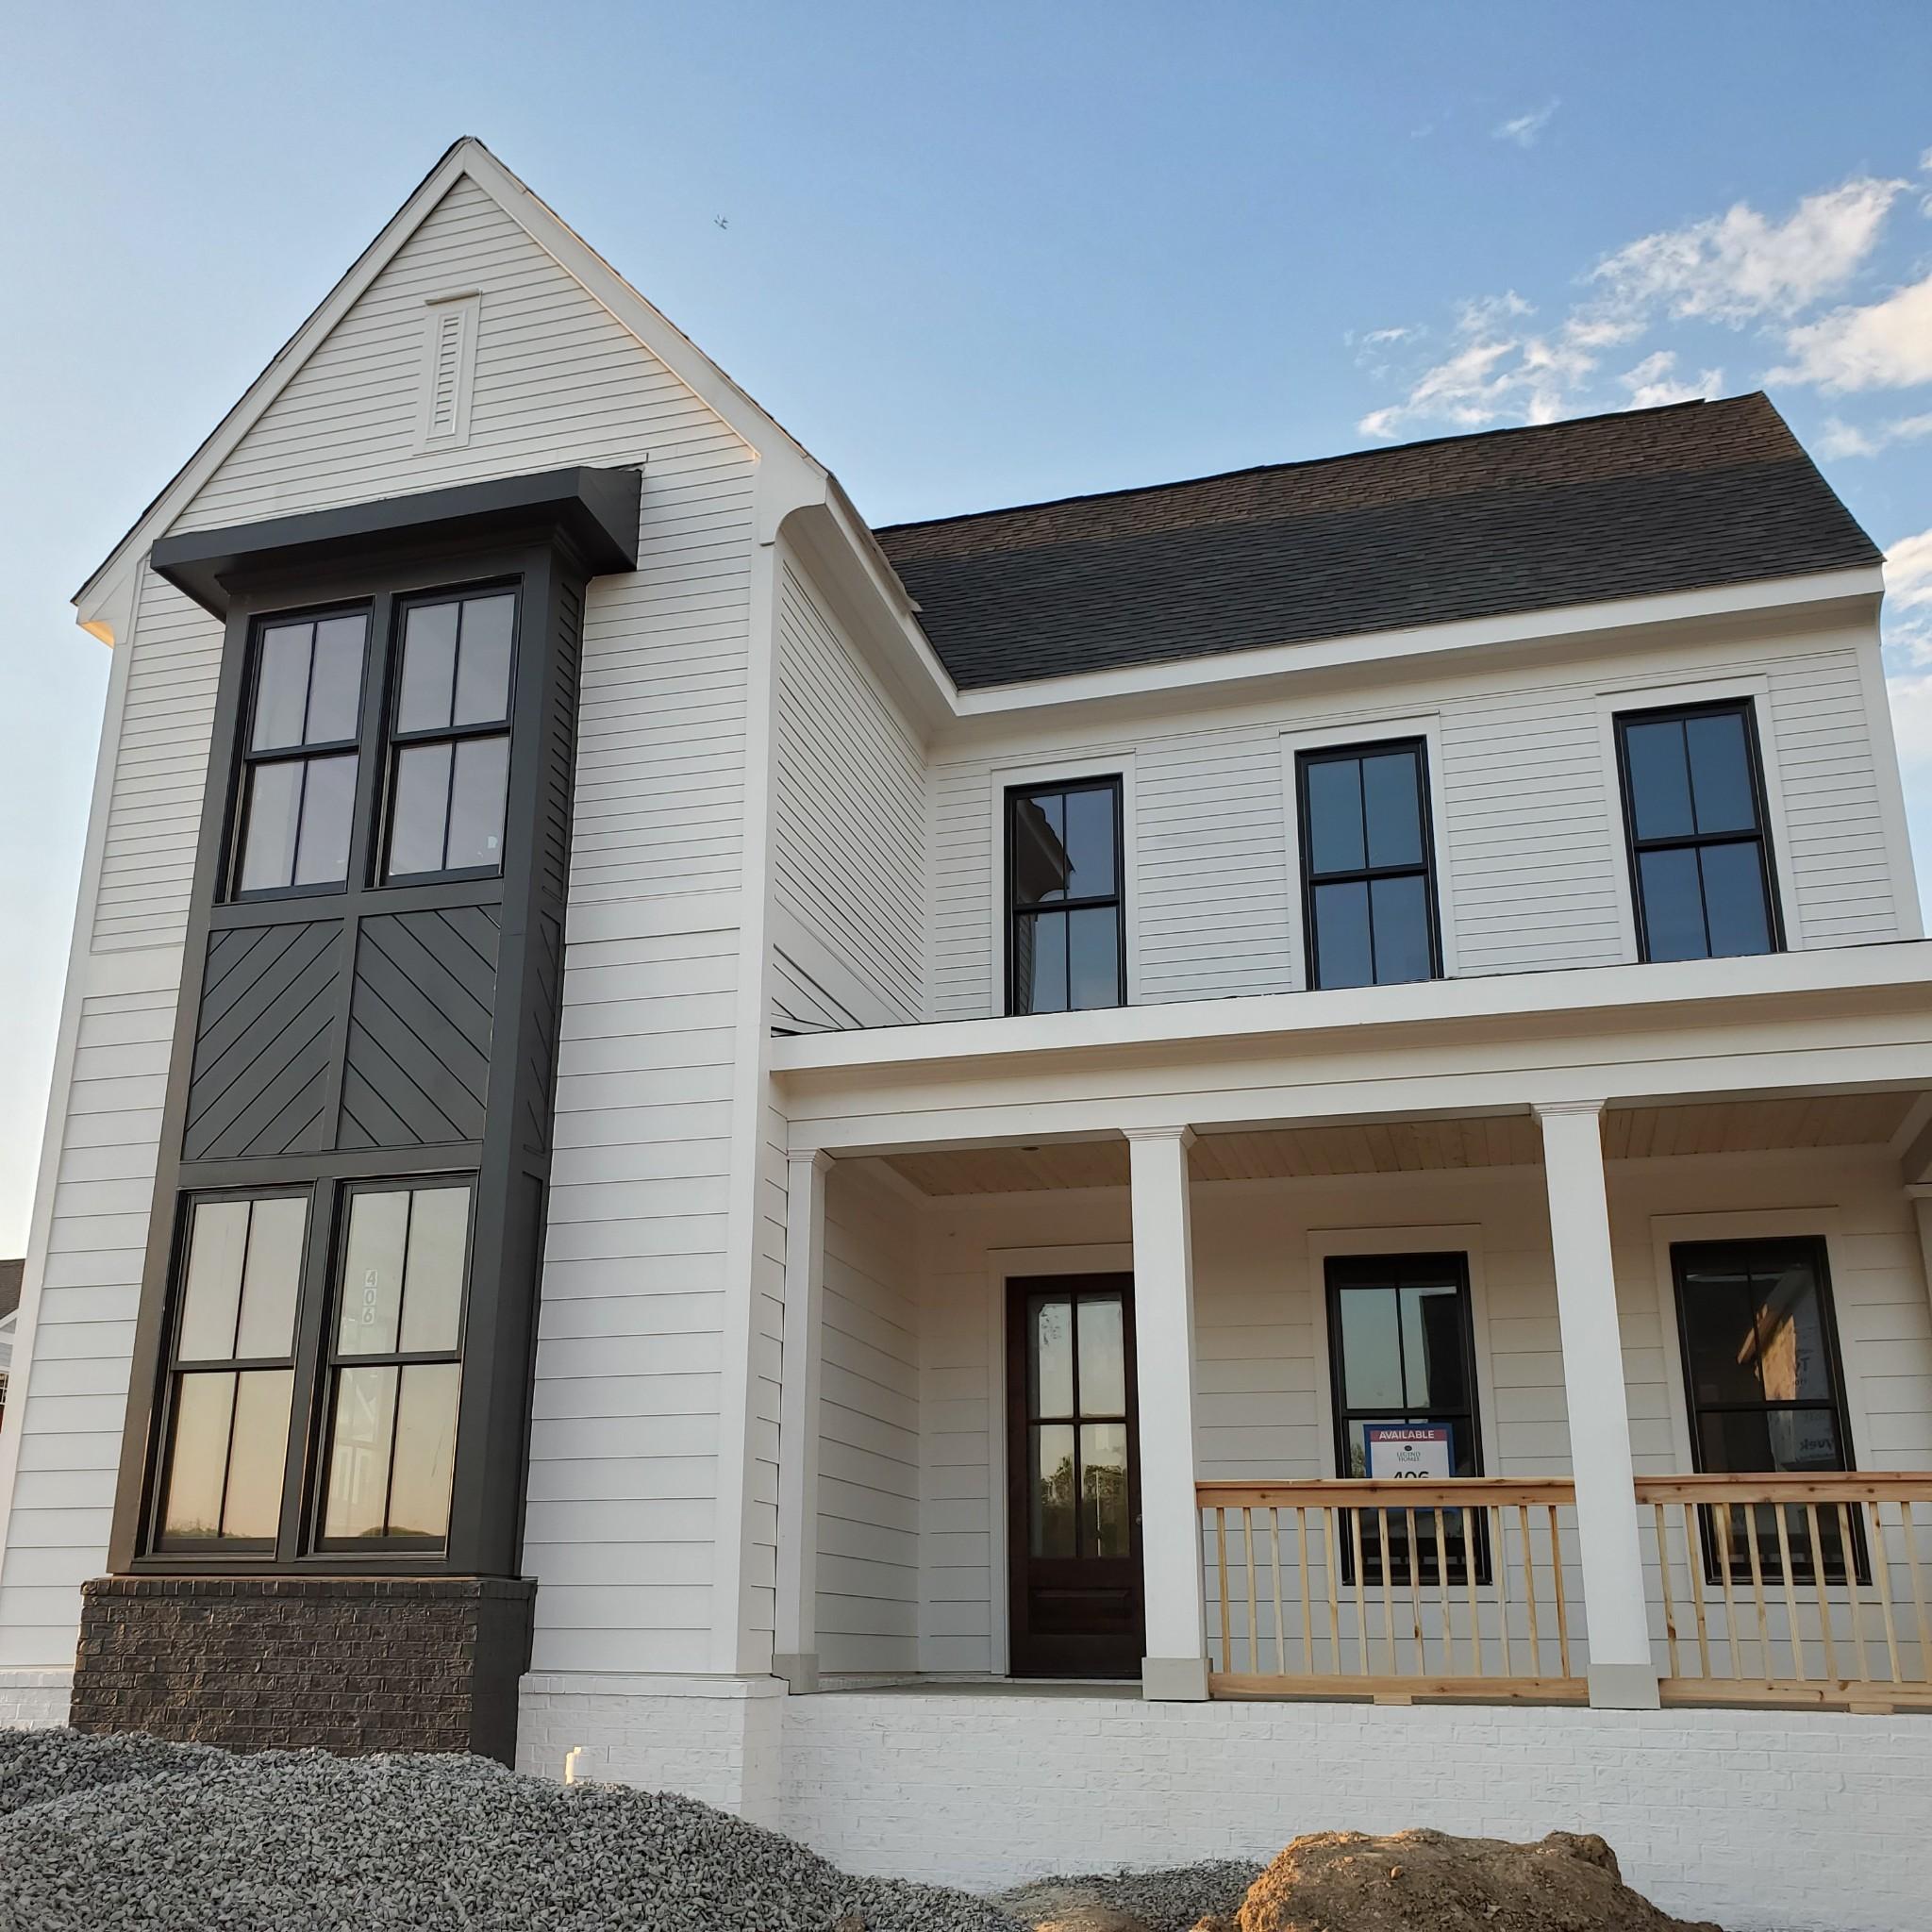 812 Carsten St-Lot 406, Nashville, TN 37221 - Nashville, TN real estate listing